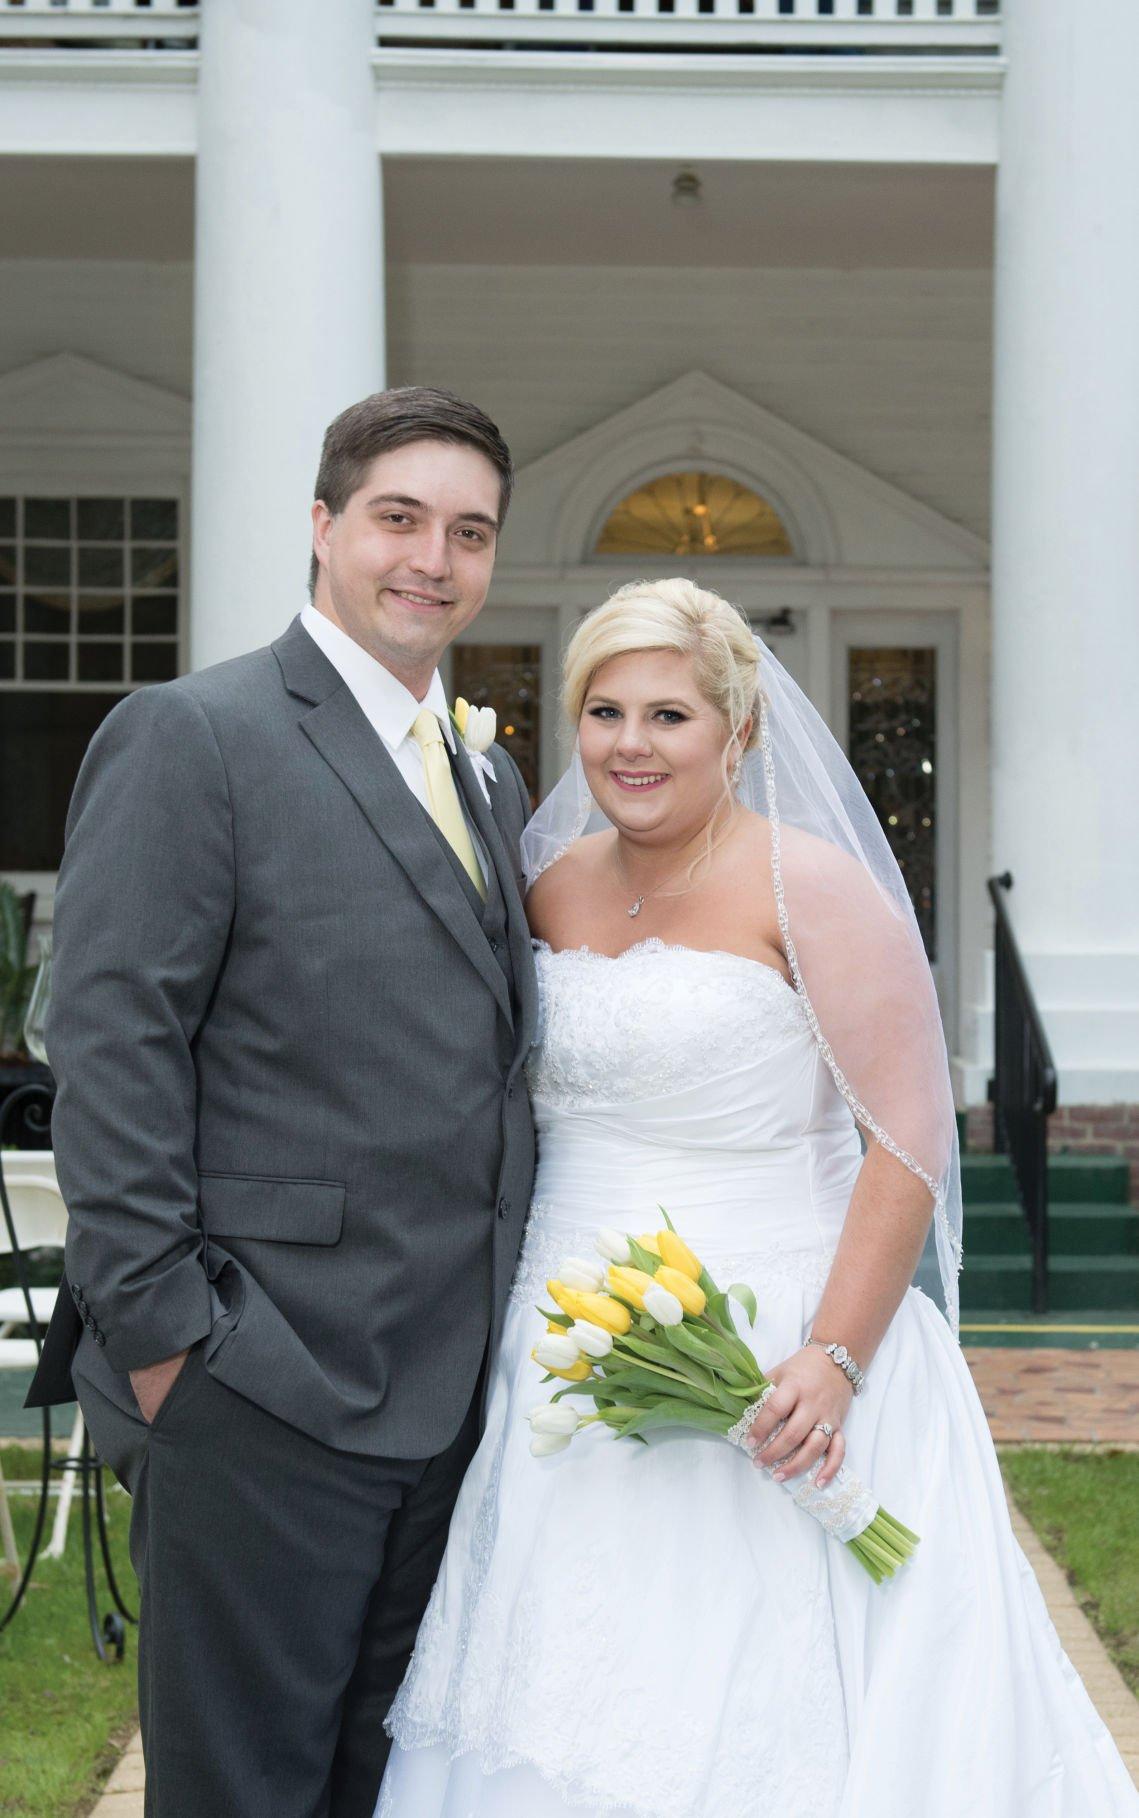 Wedding: LeBlanc/Freeman